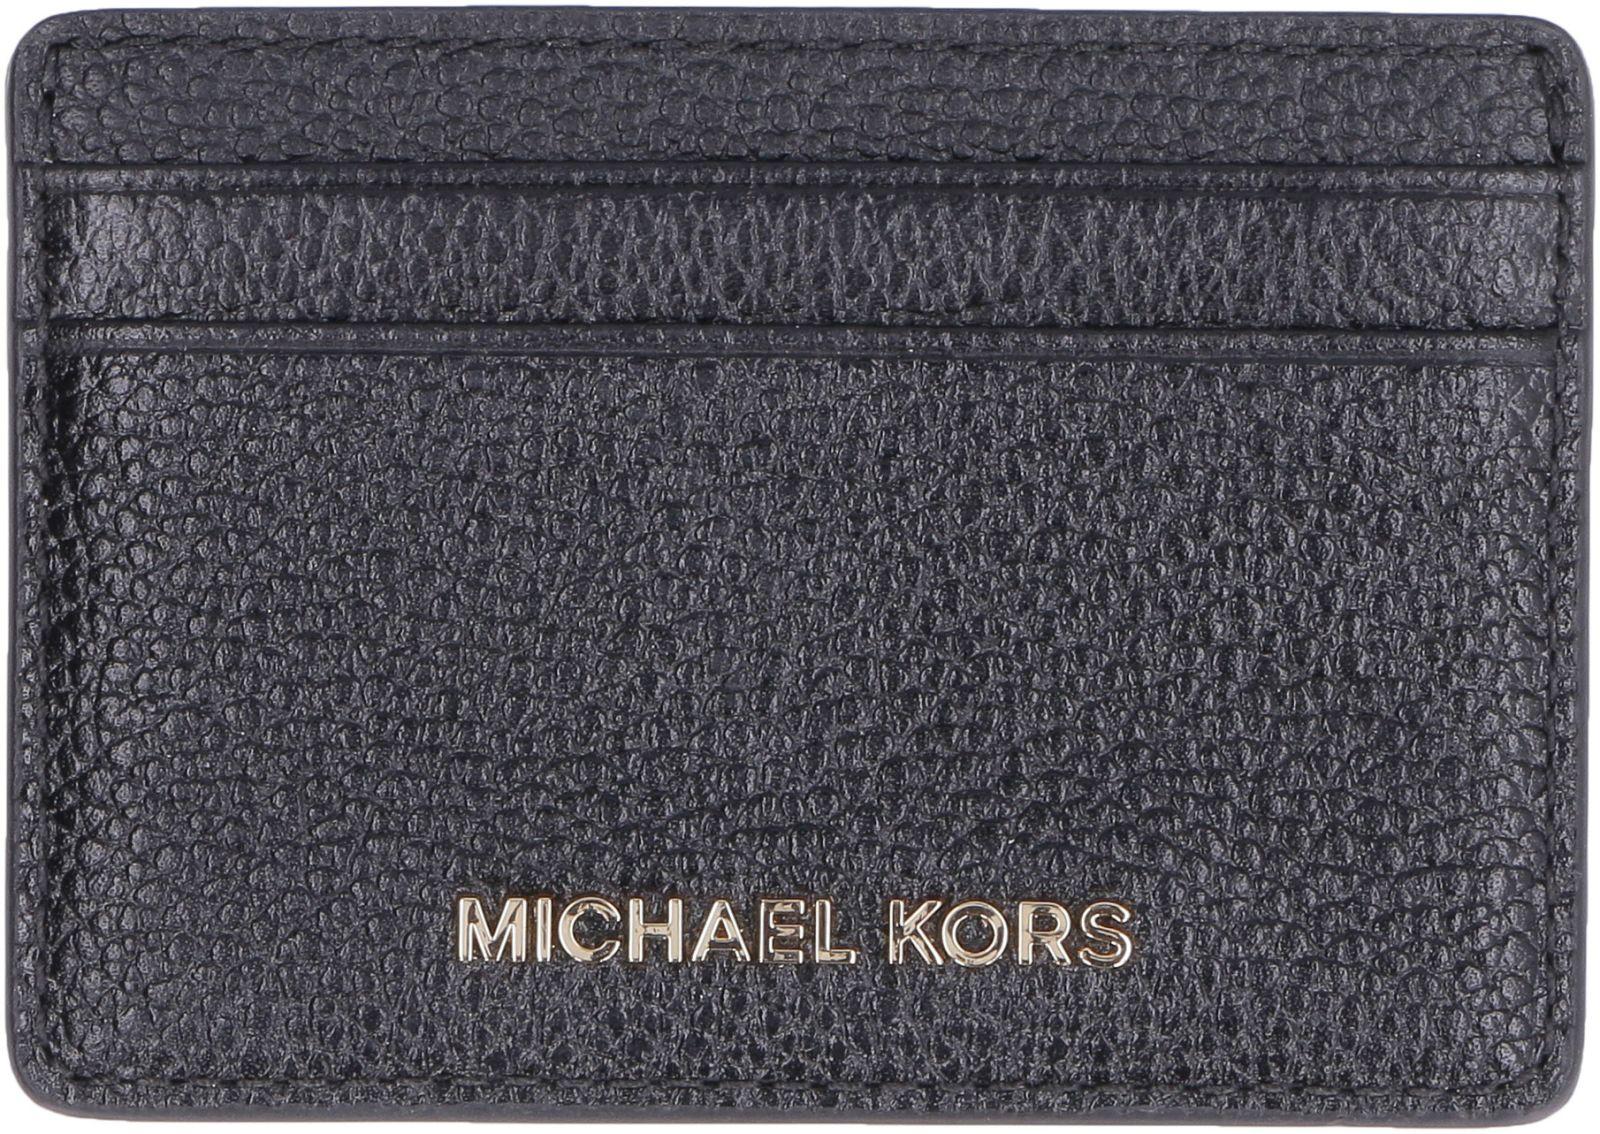 964e2d1f7127 Michael Kors Michael Kors Money Pieces Pebbled Leather Card Holder ...